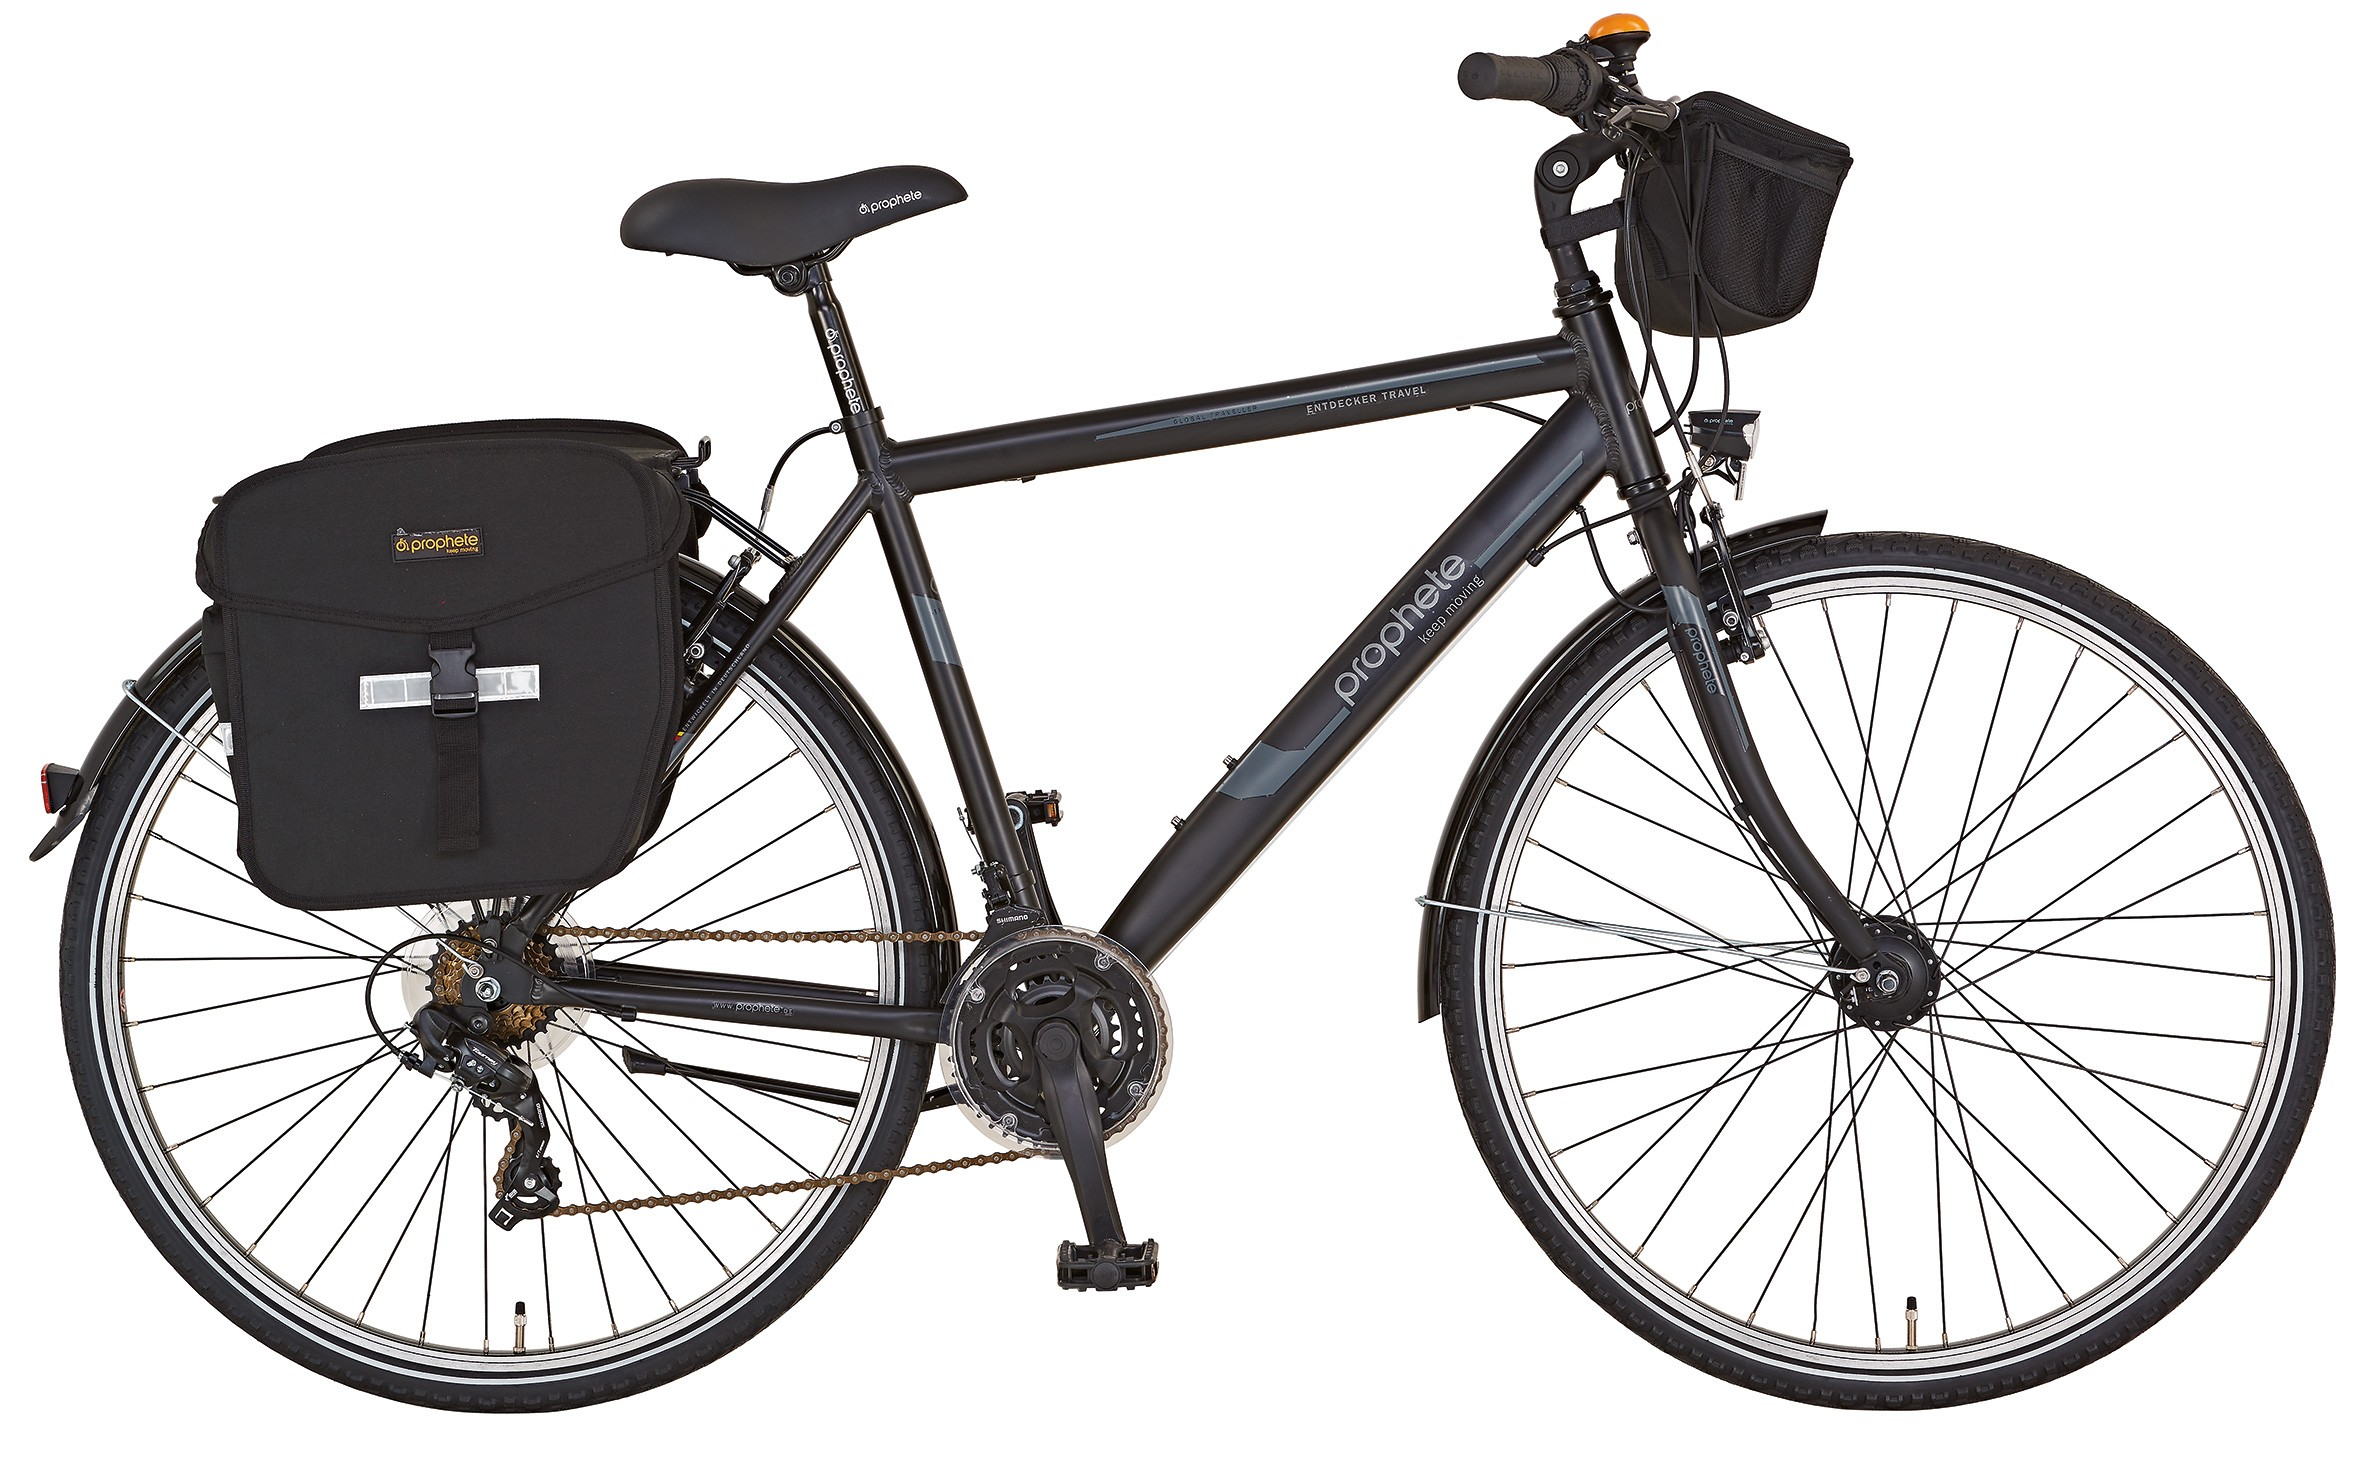 fahrrad trekkingrad alu trekking herren entdecker travel 28 prophete bei. Black Bedroom Furniture Sets. Home Design Ideas